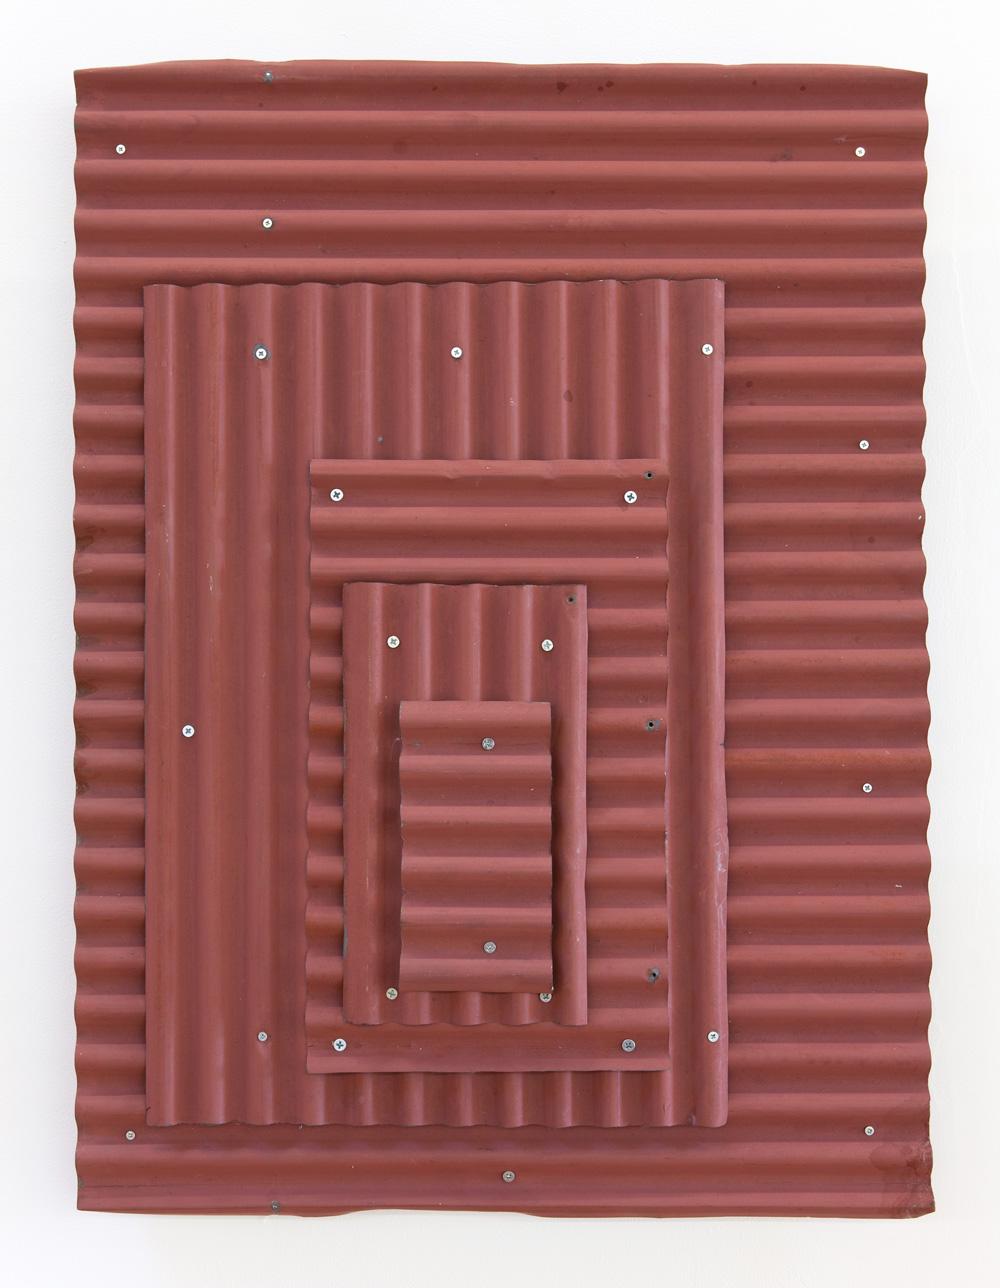 Space in the Middle , 1996 集位在間 ( Shūi Zaikan ) Corrugated galvanized iron, acrylic 29 7/8 x 22 7/16 x 3 1/2 inches 76 x 57 x 9 cm